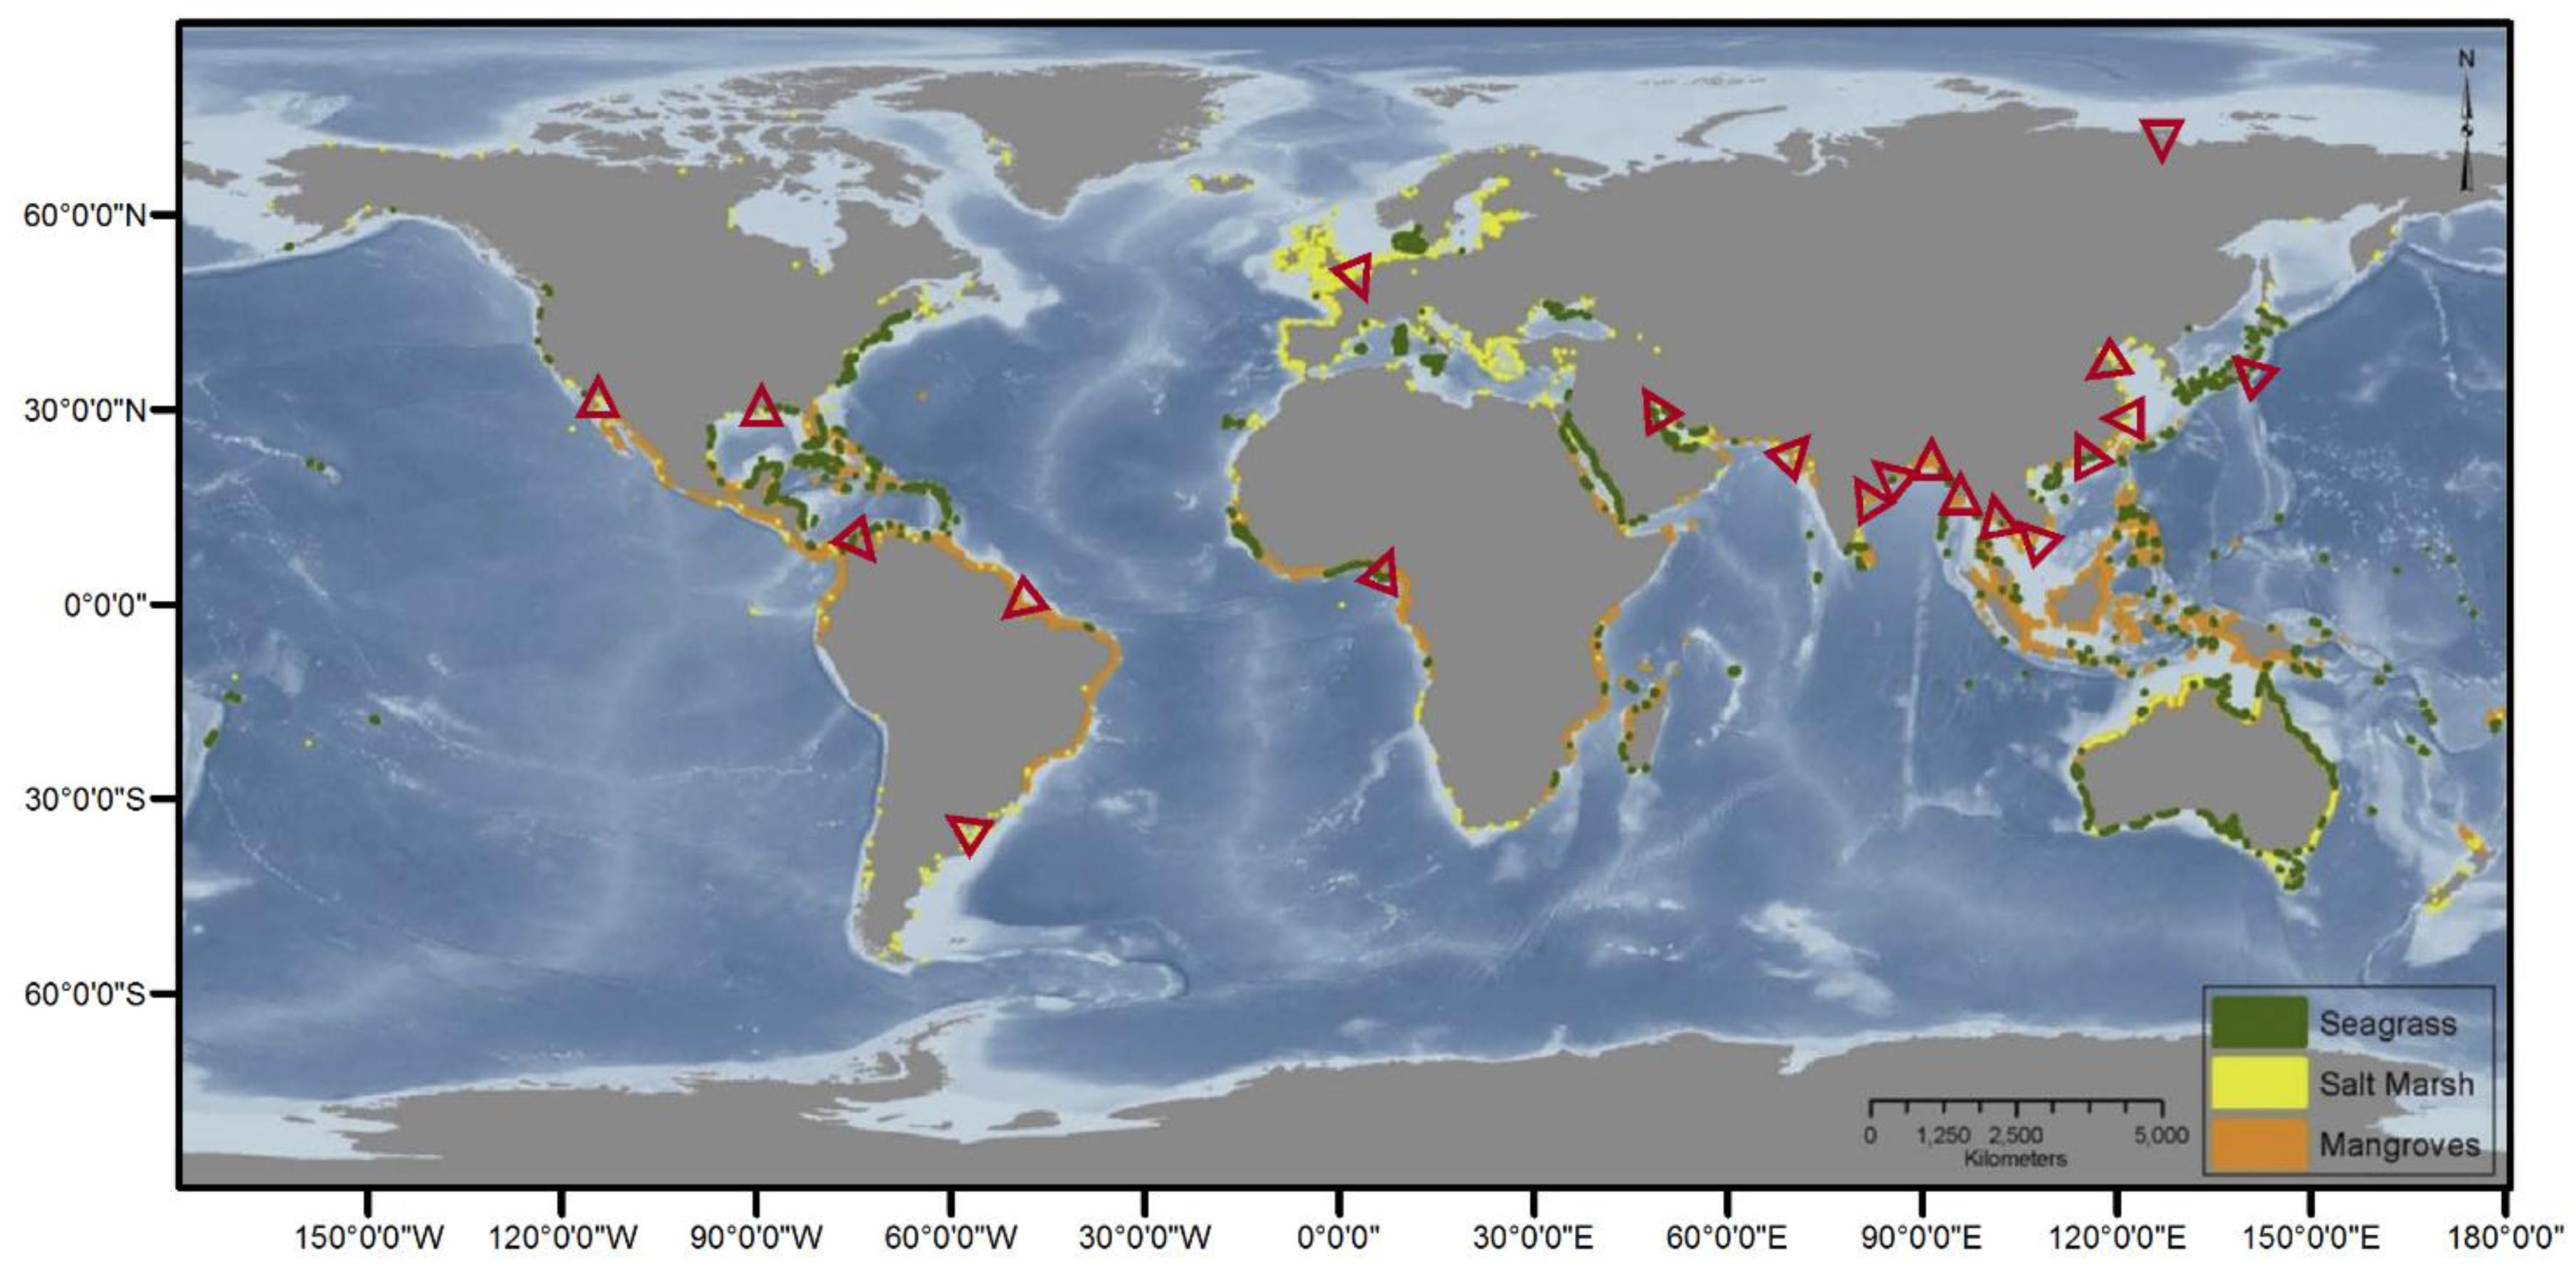 remotesensing 07 10184 g001 1024 to humans coastal wetlands